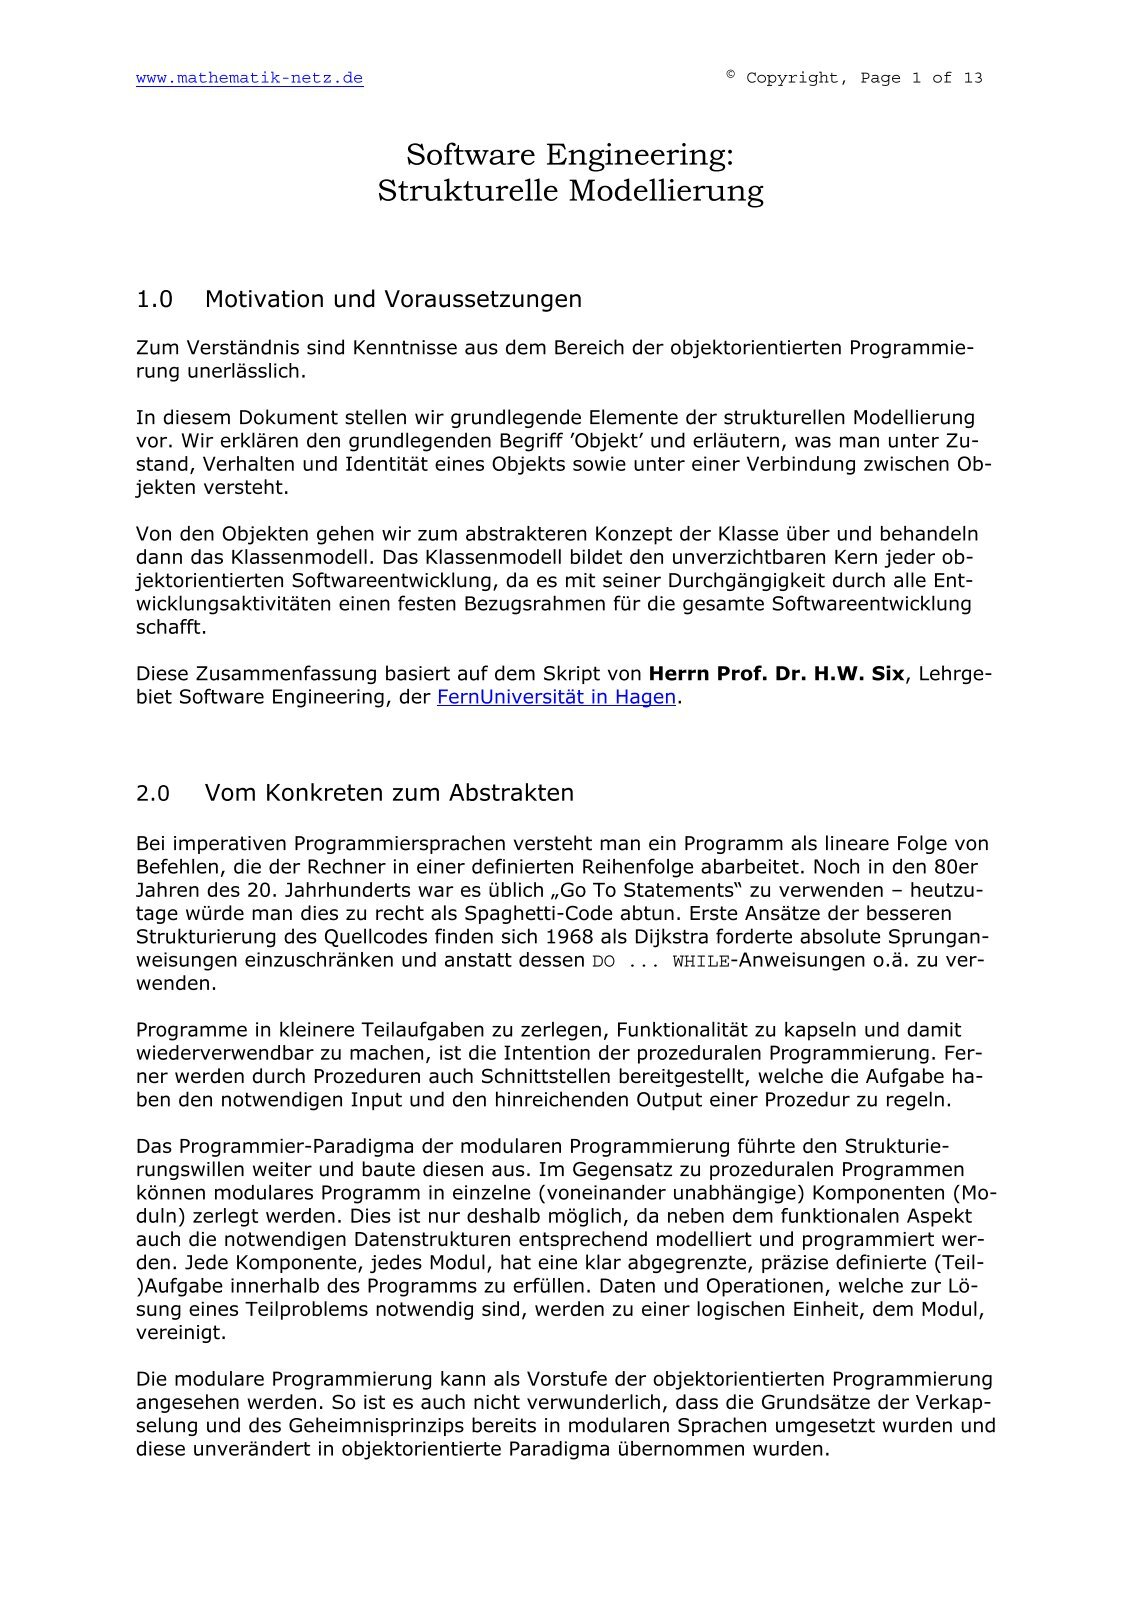 4 free Magazines from MATHEMATIK.NETZ.DE